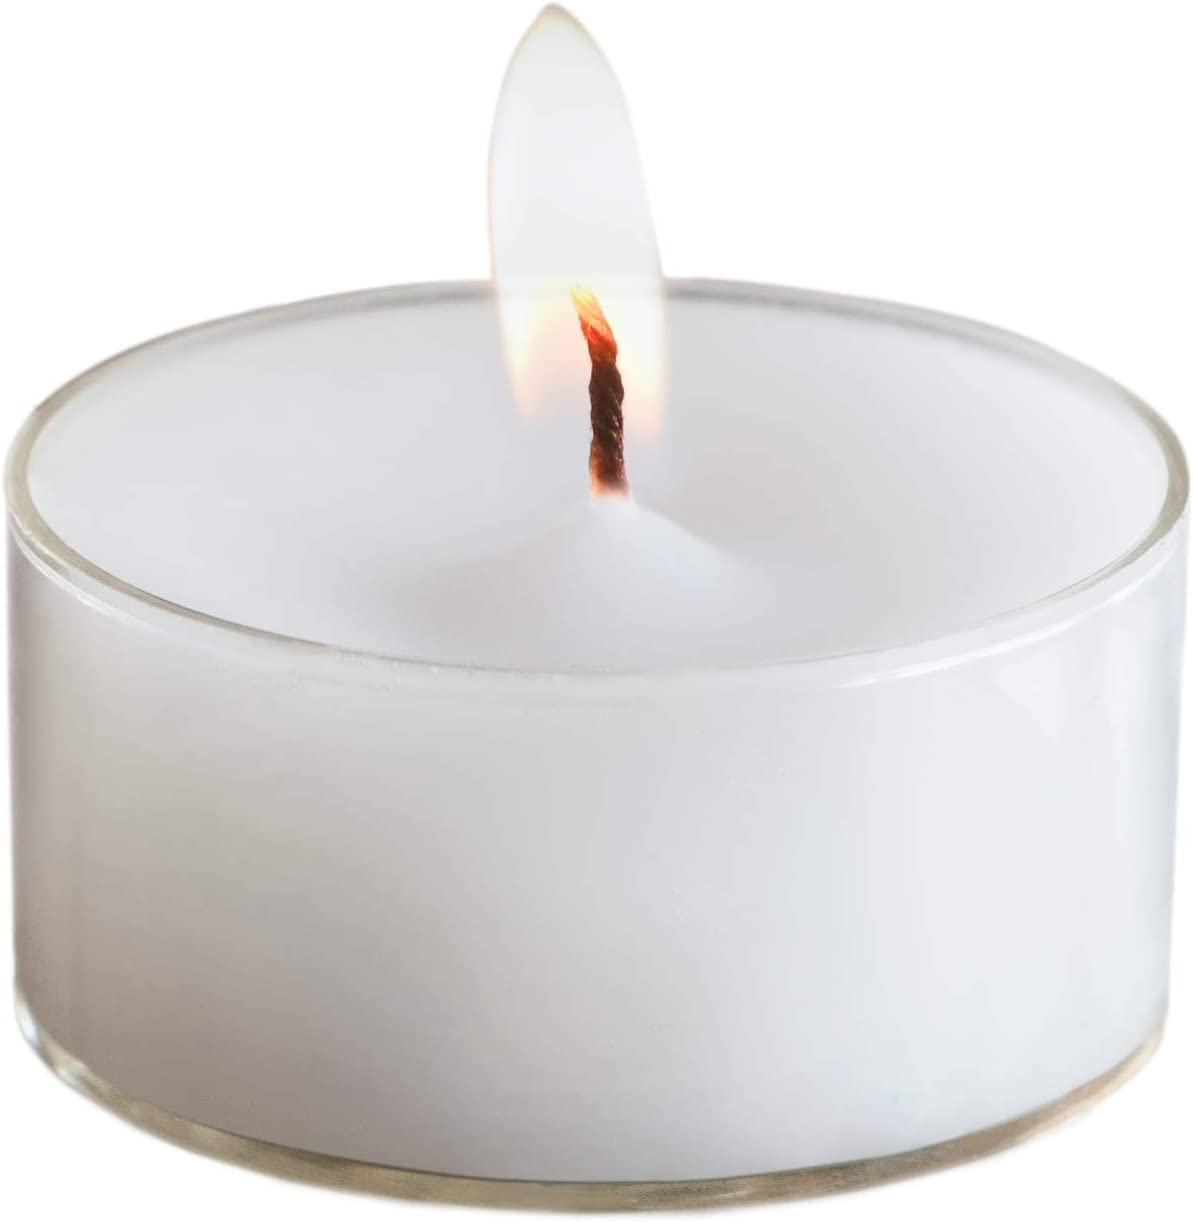 bianche EDZARD Maxilights 16 candele Diametro 58 mm custodia transparente luci giganti